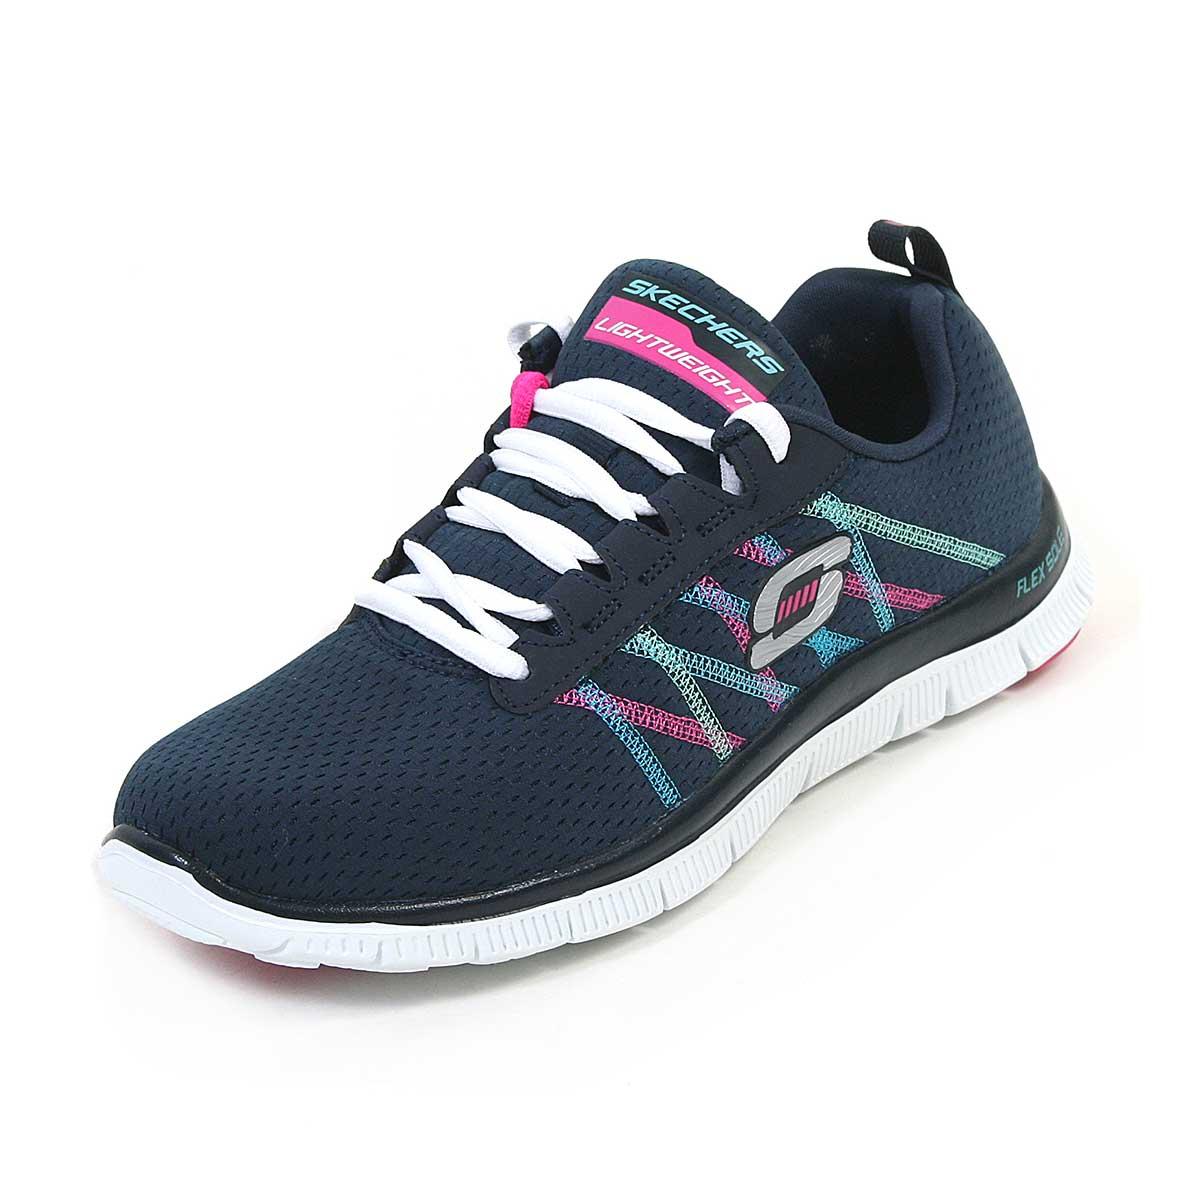 7fc72a521e5 Buy Skechers Flex Appeal Womens Running Shoes (Navy   Multi) Online